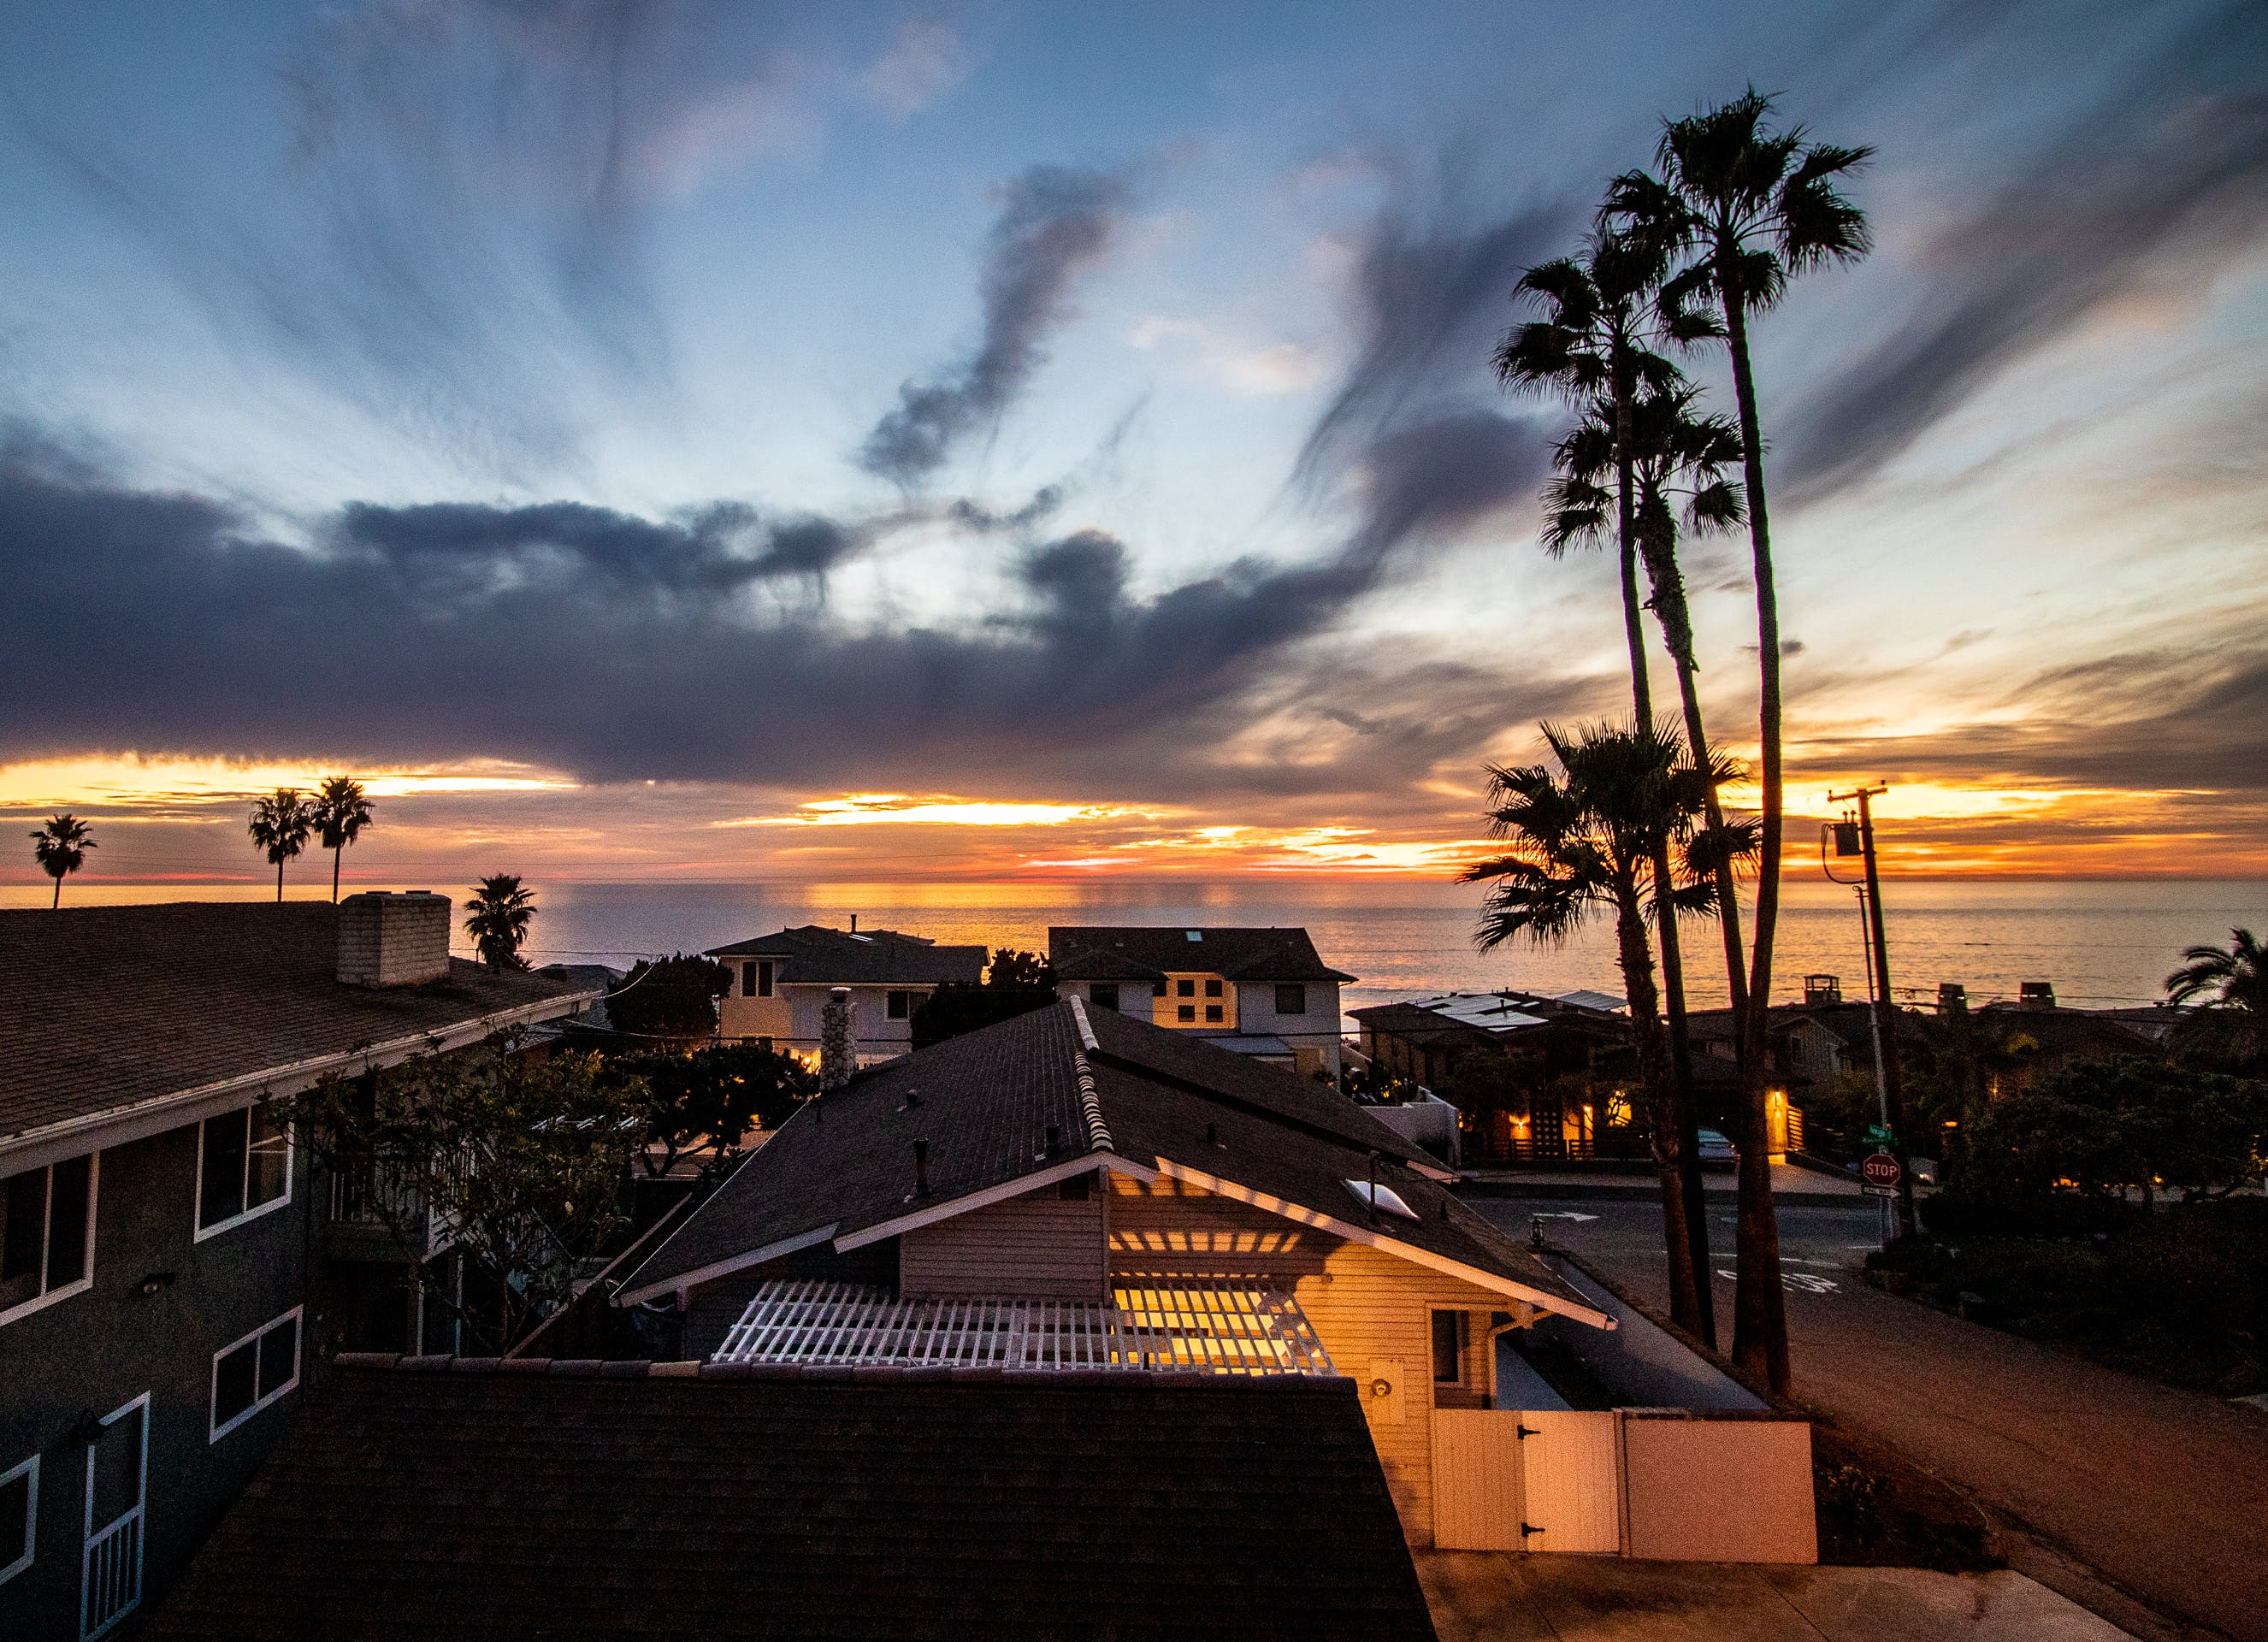 Free stock photo of encinitas, Grandview, ocean, palm trees